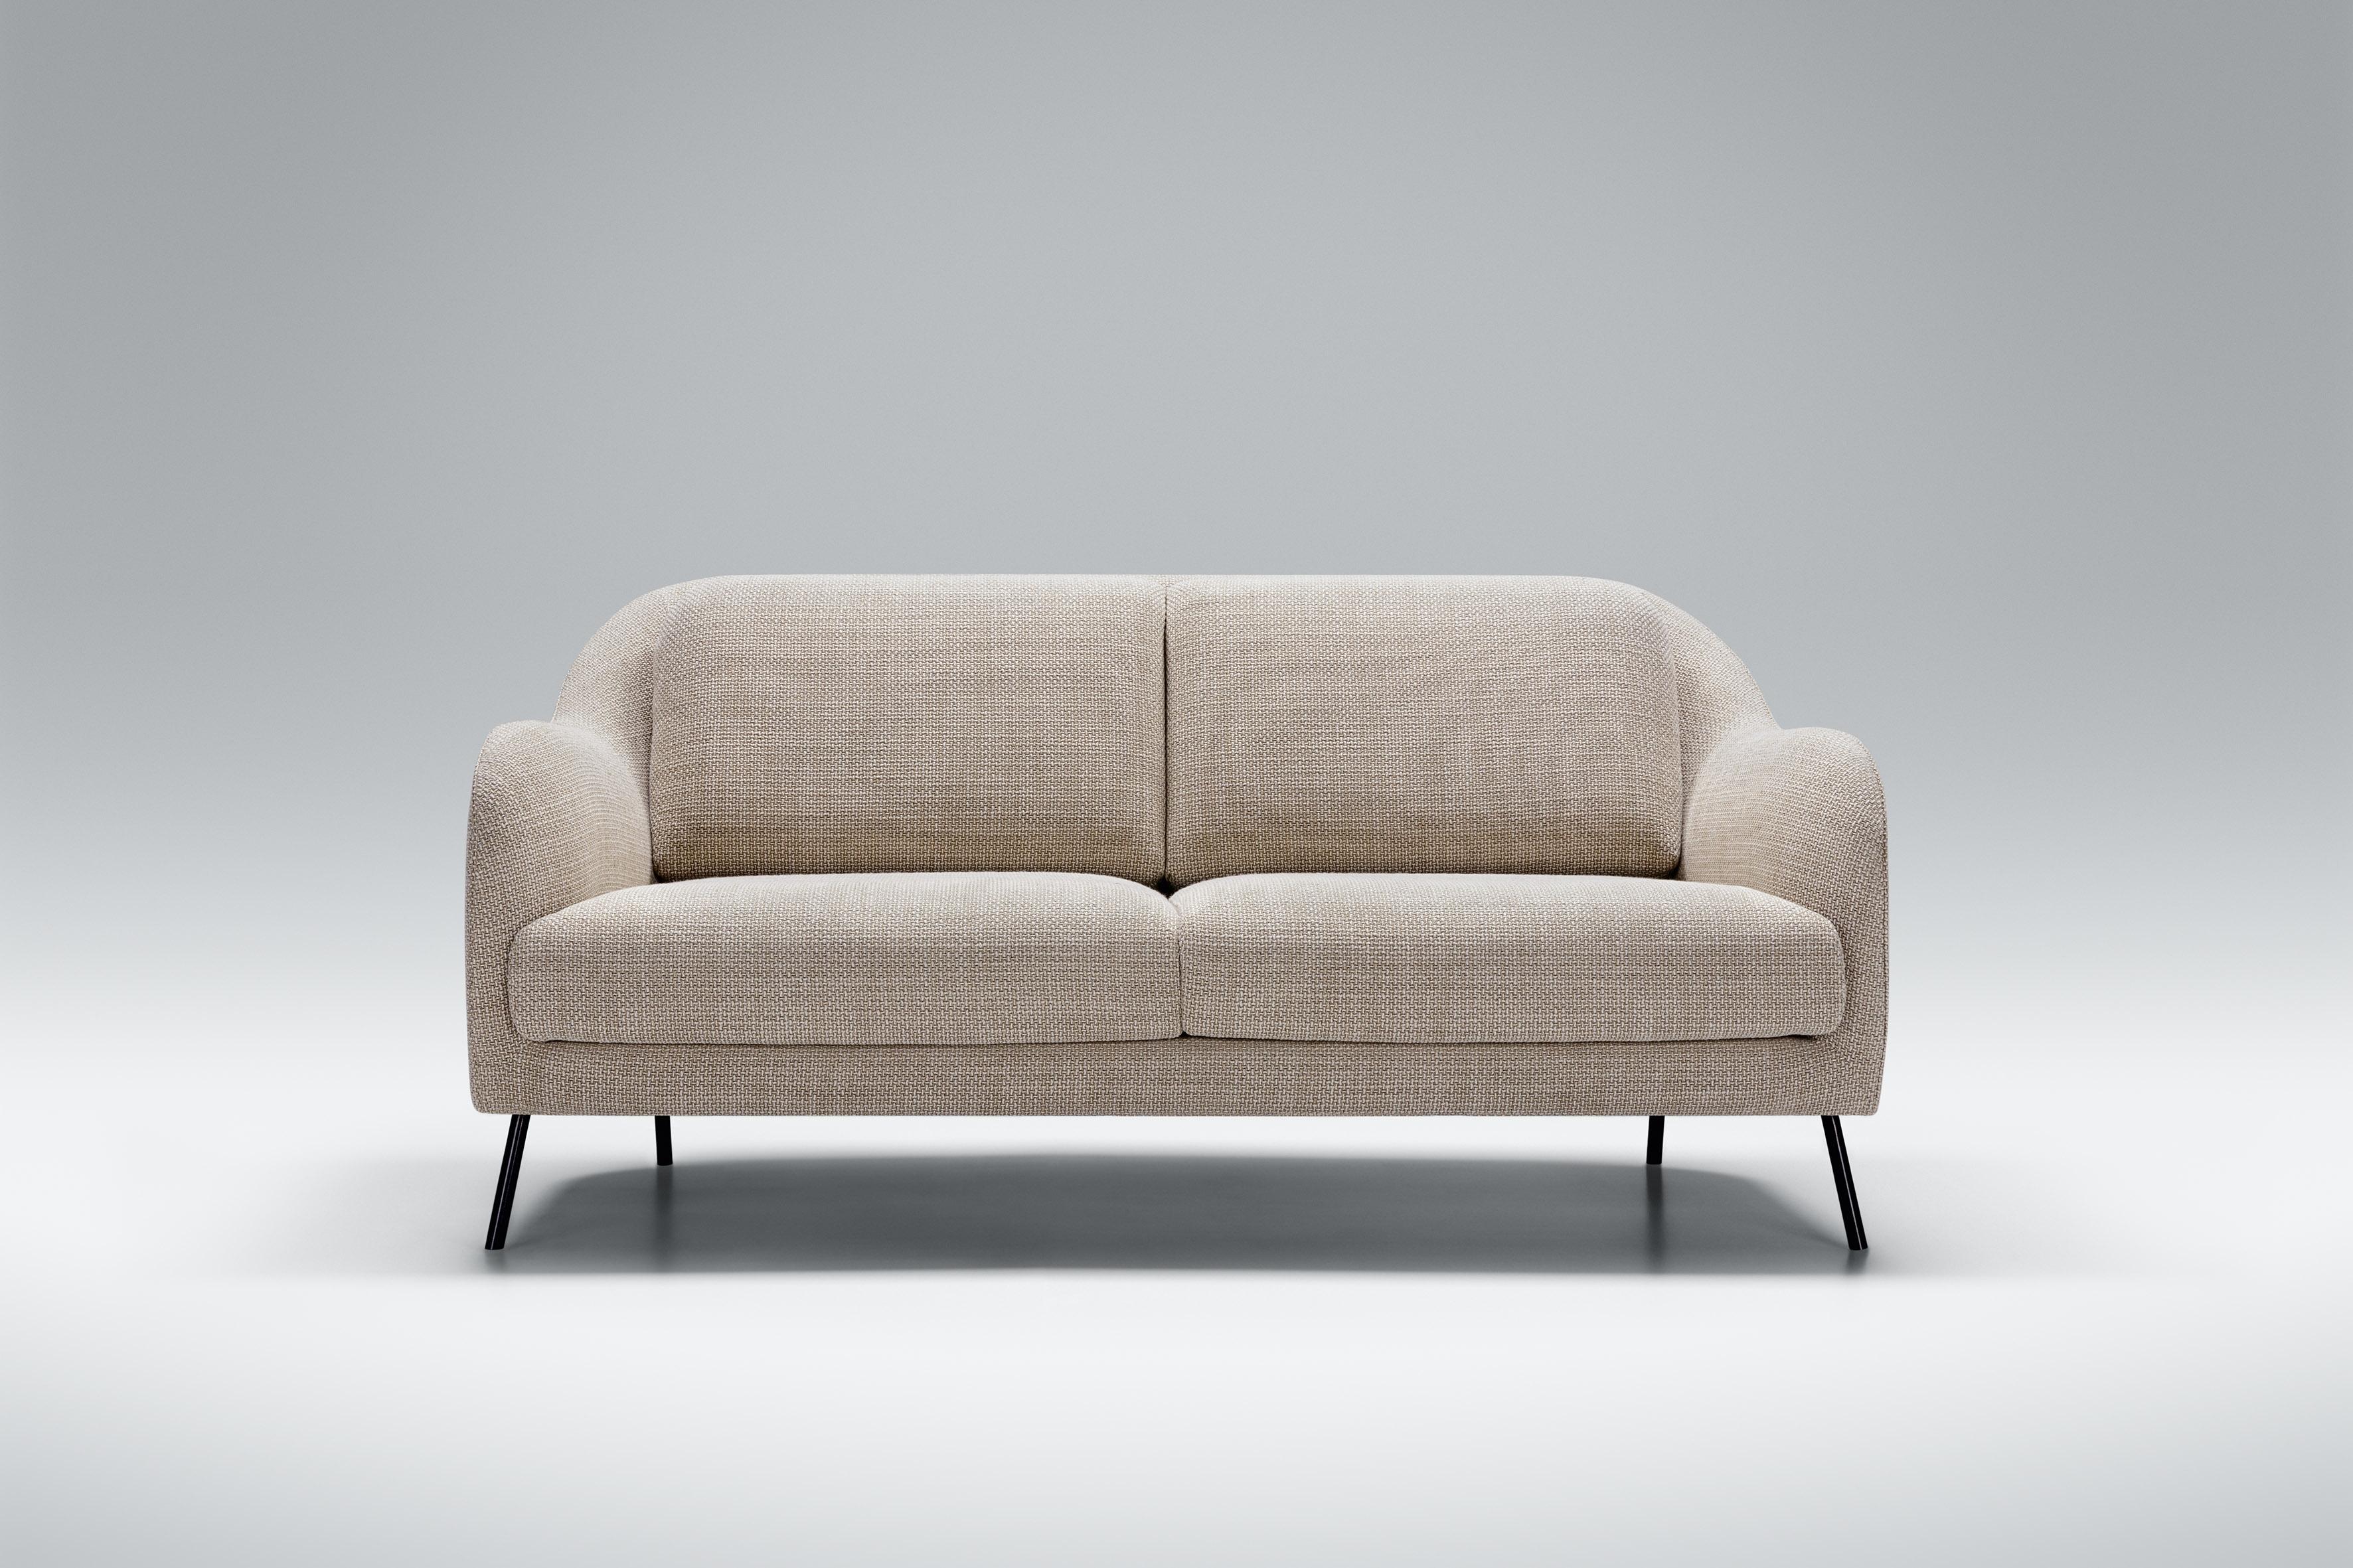 Ibsen 2 seater sofa